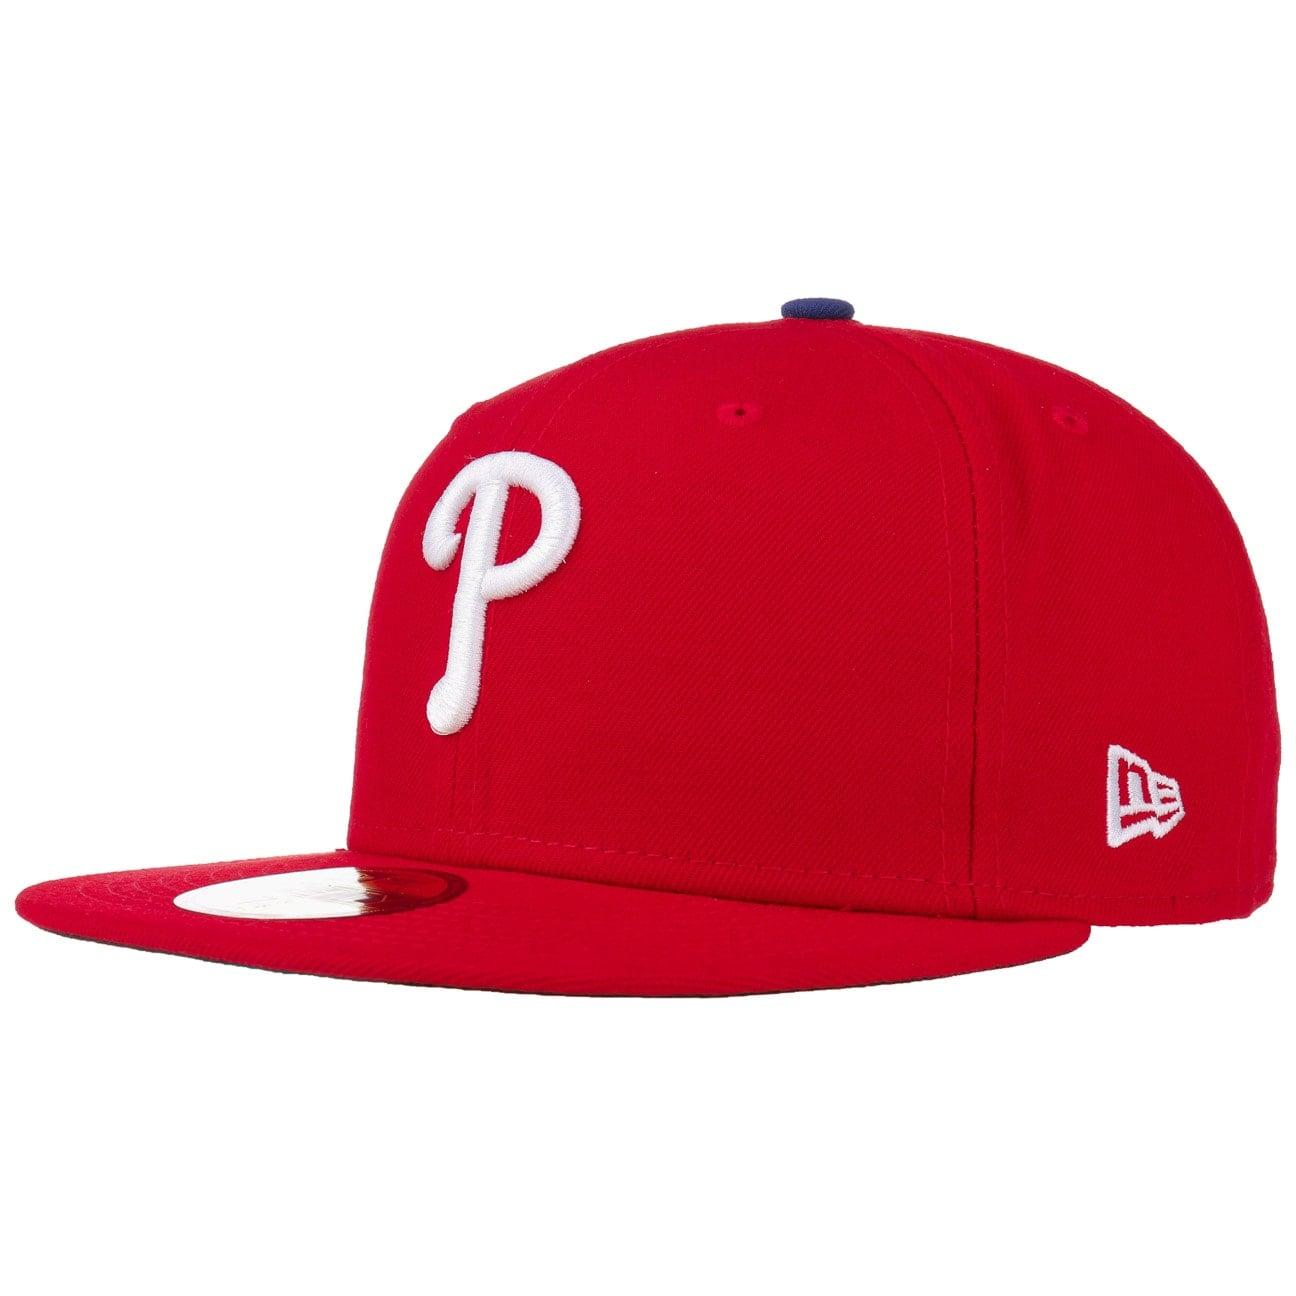 Casquette 59Fifty AC Perf Phillies by New Era  casquette de baseball